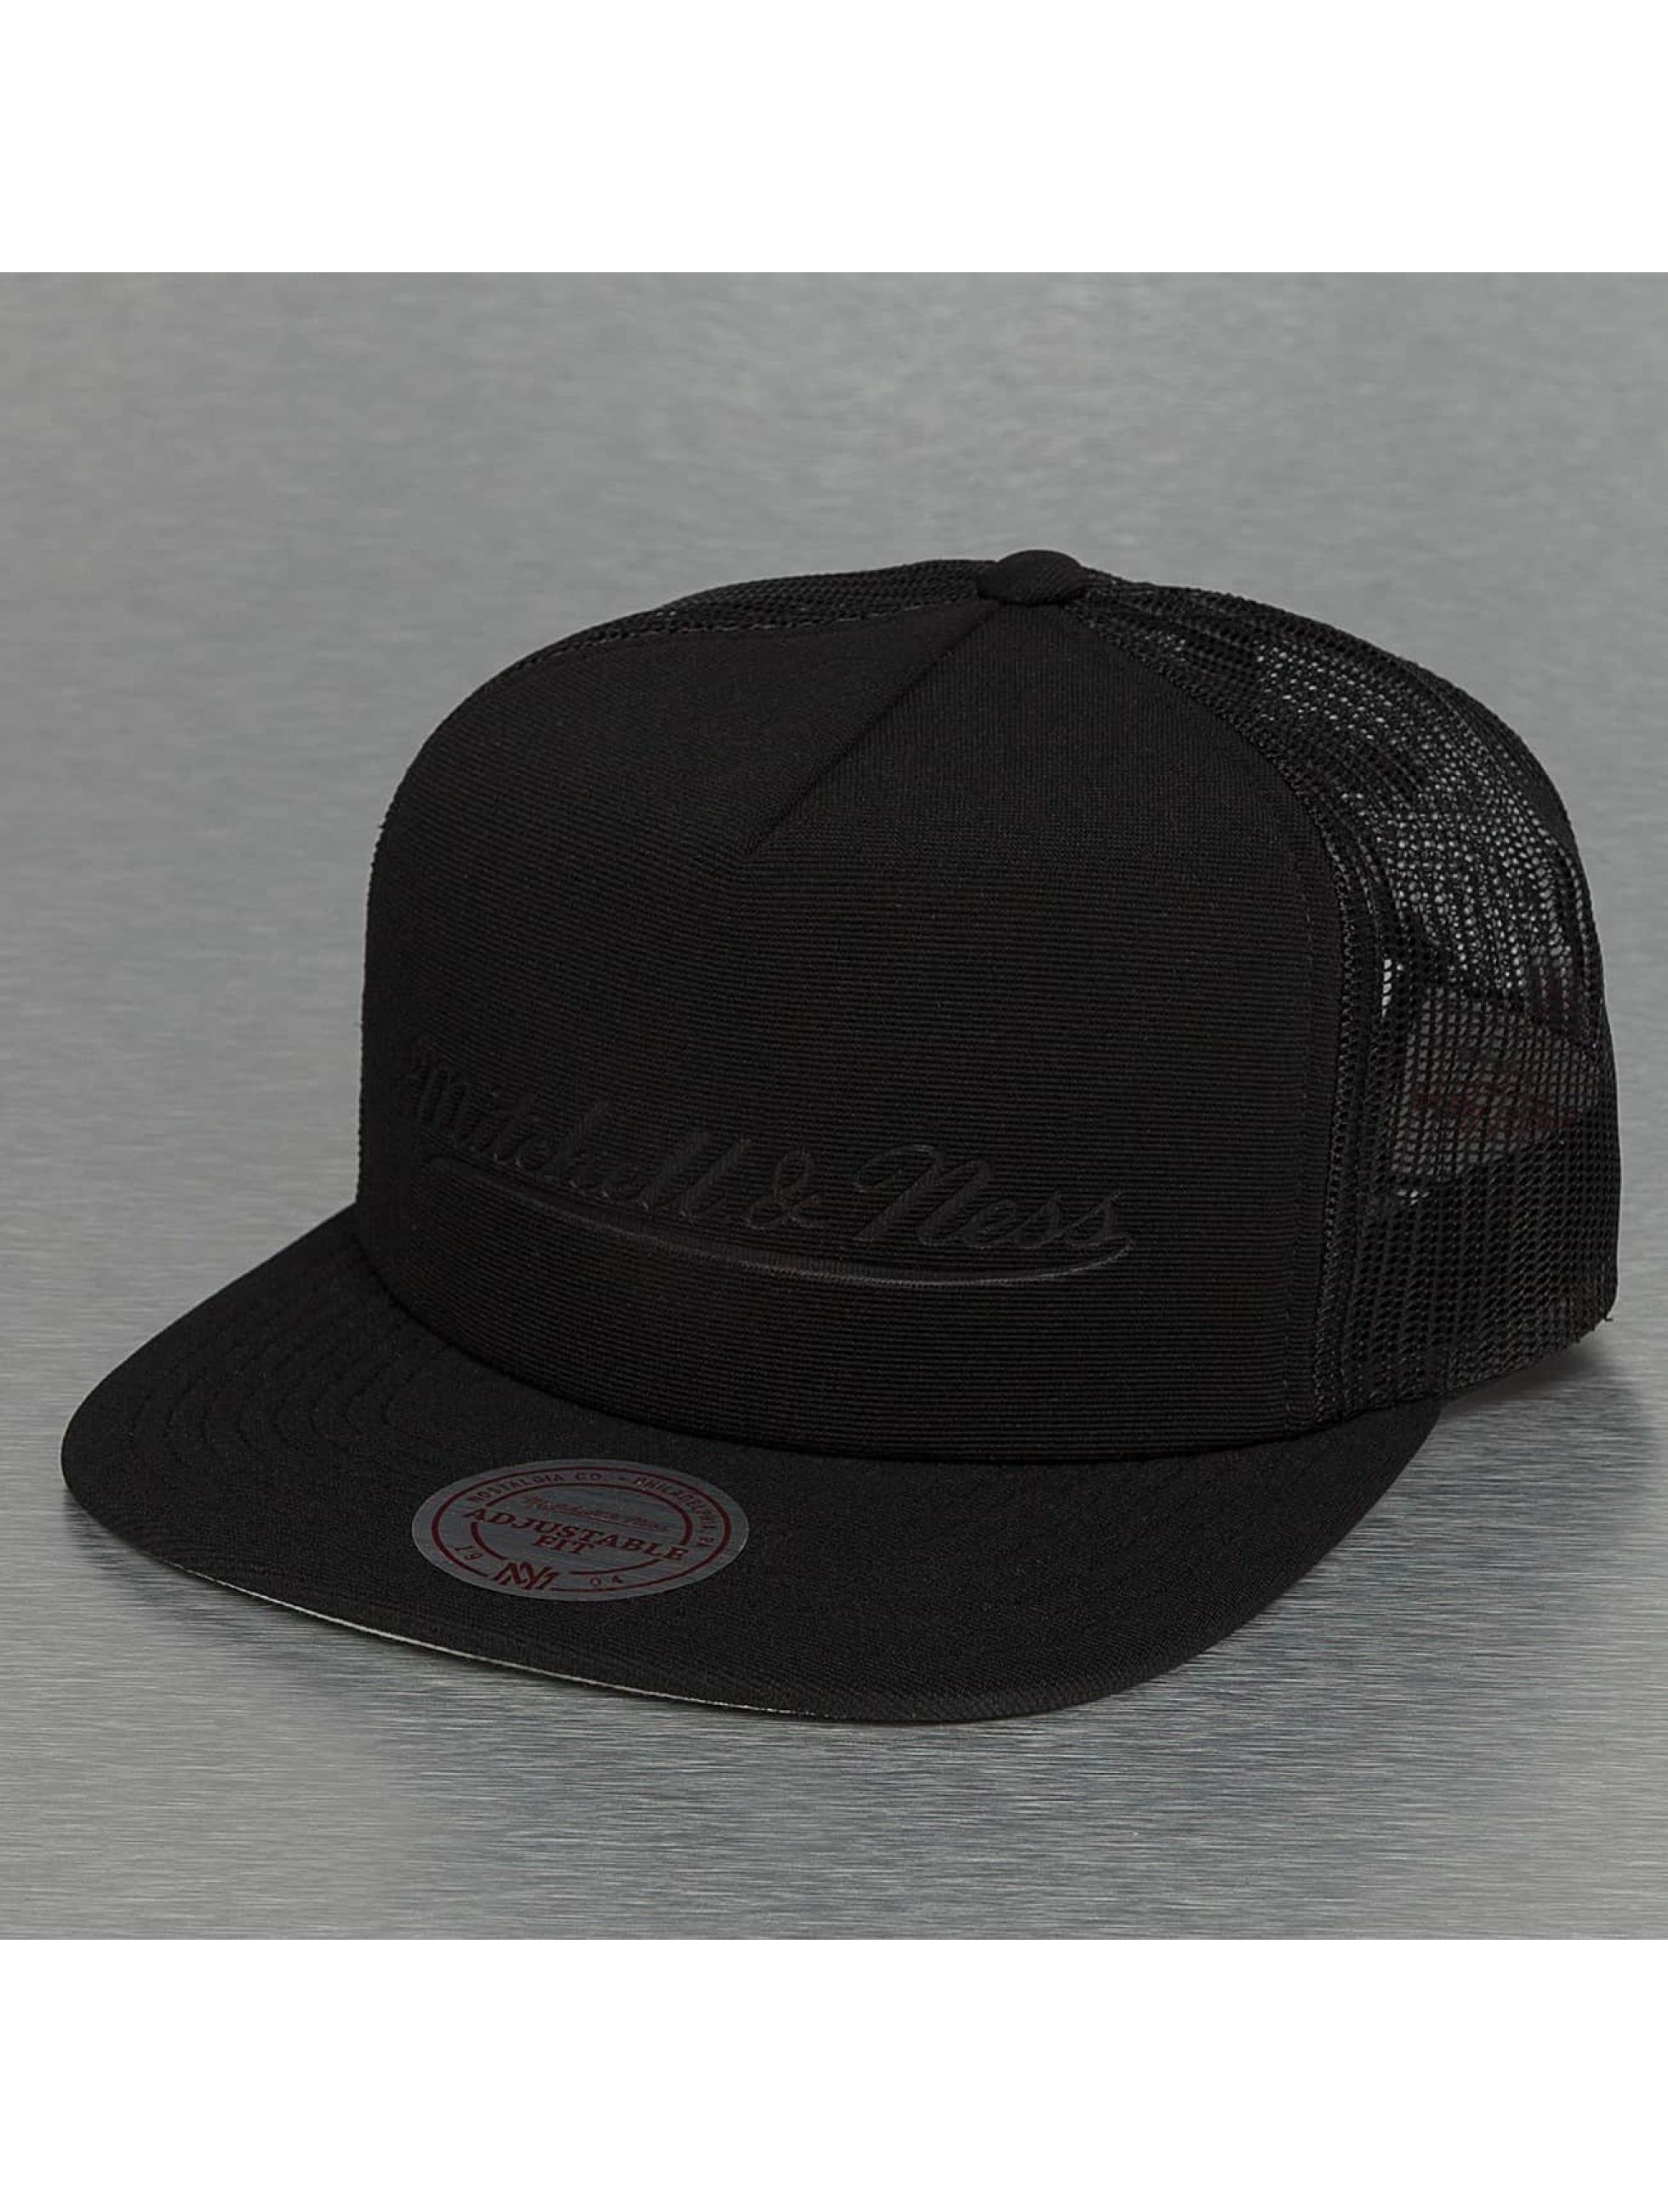 Mitchell & Ness Tonal D Trucker Snapback Cap Black Sale Angebote